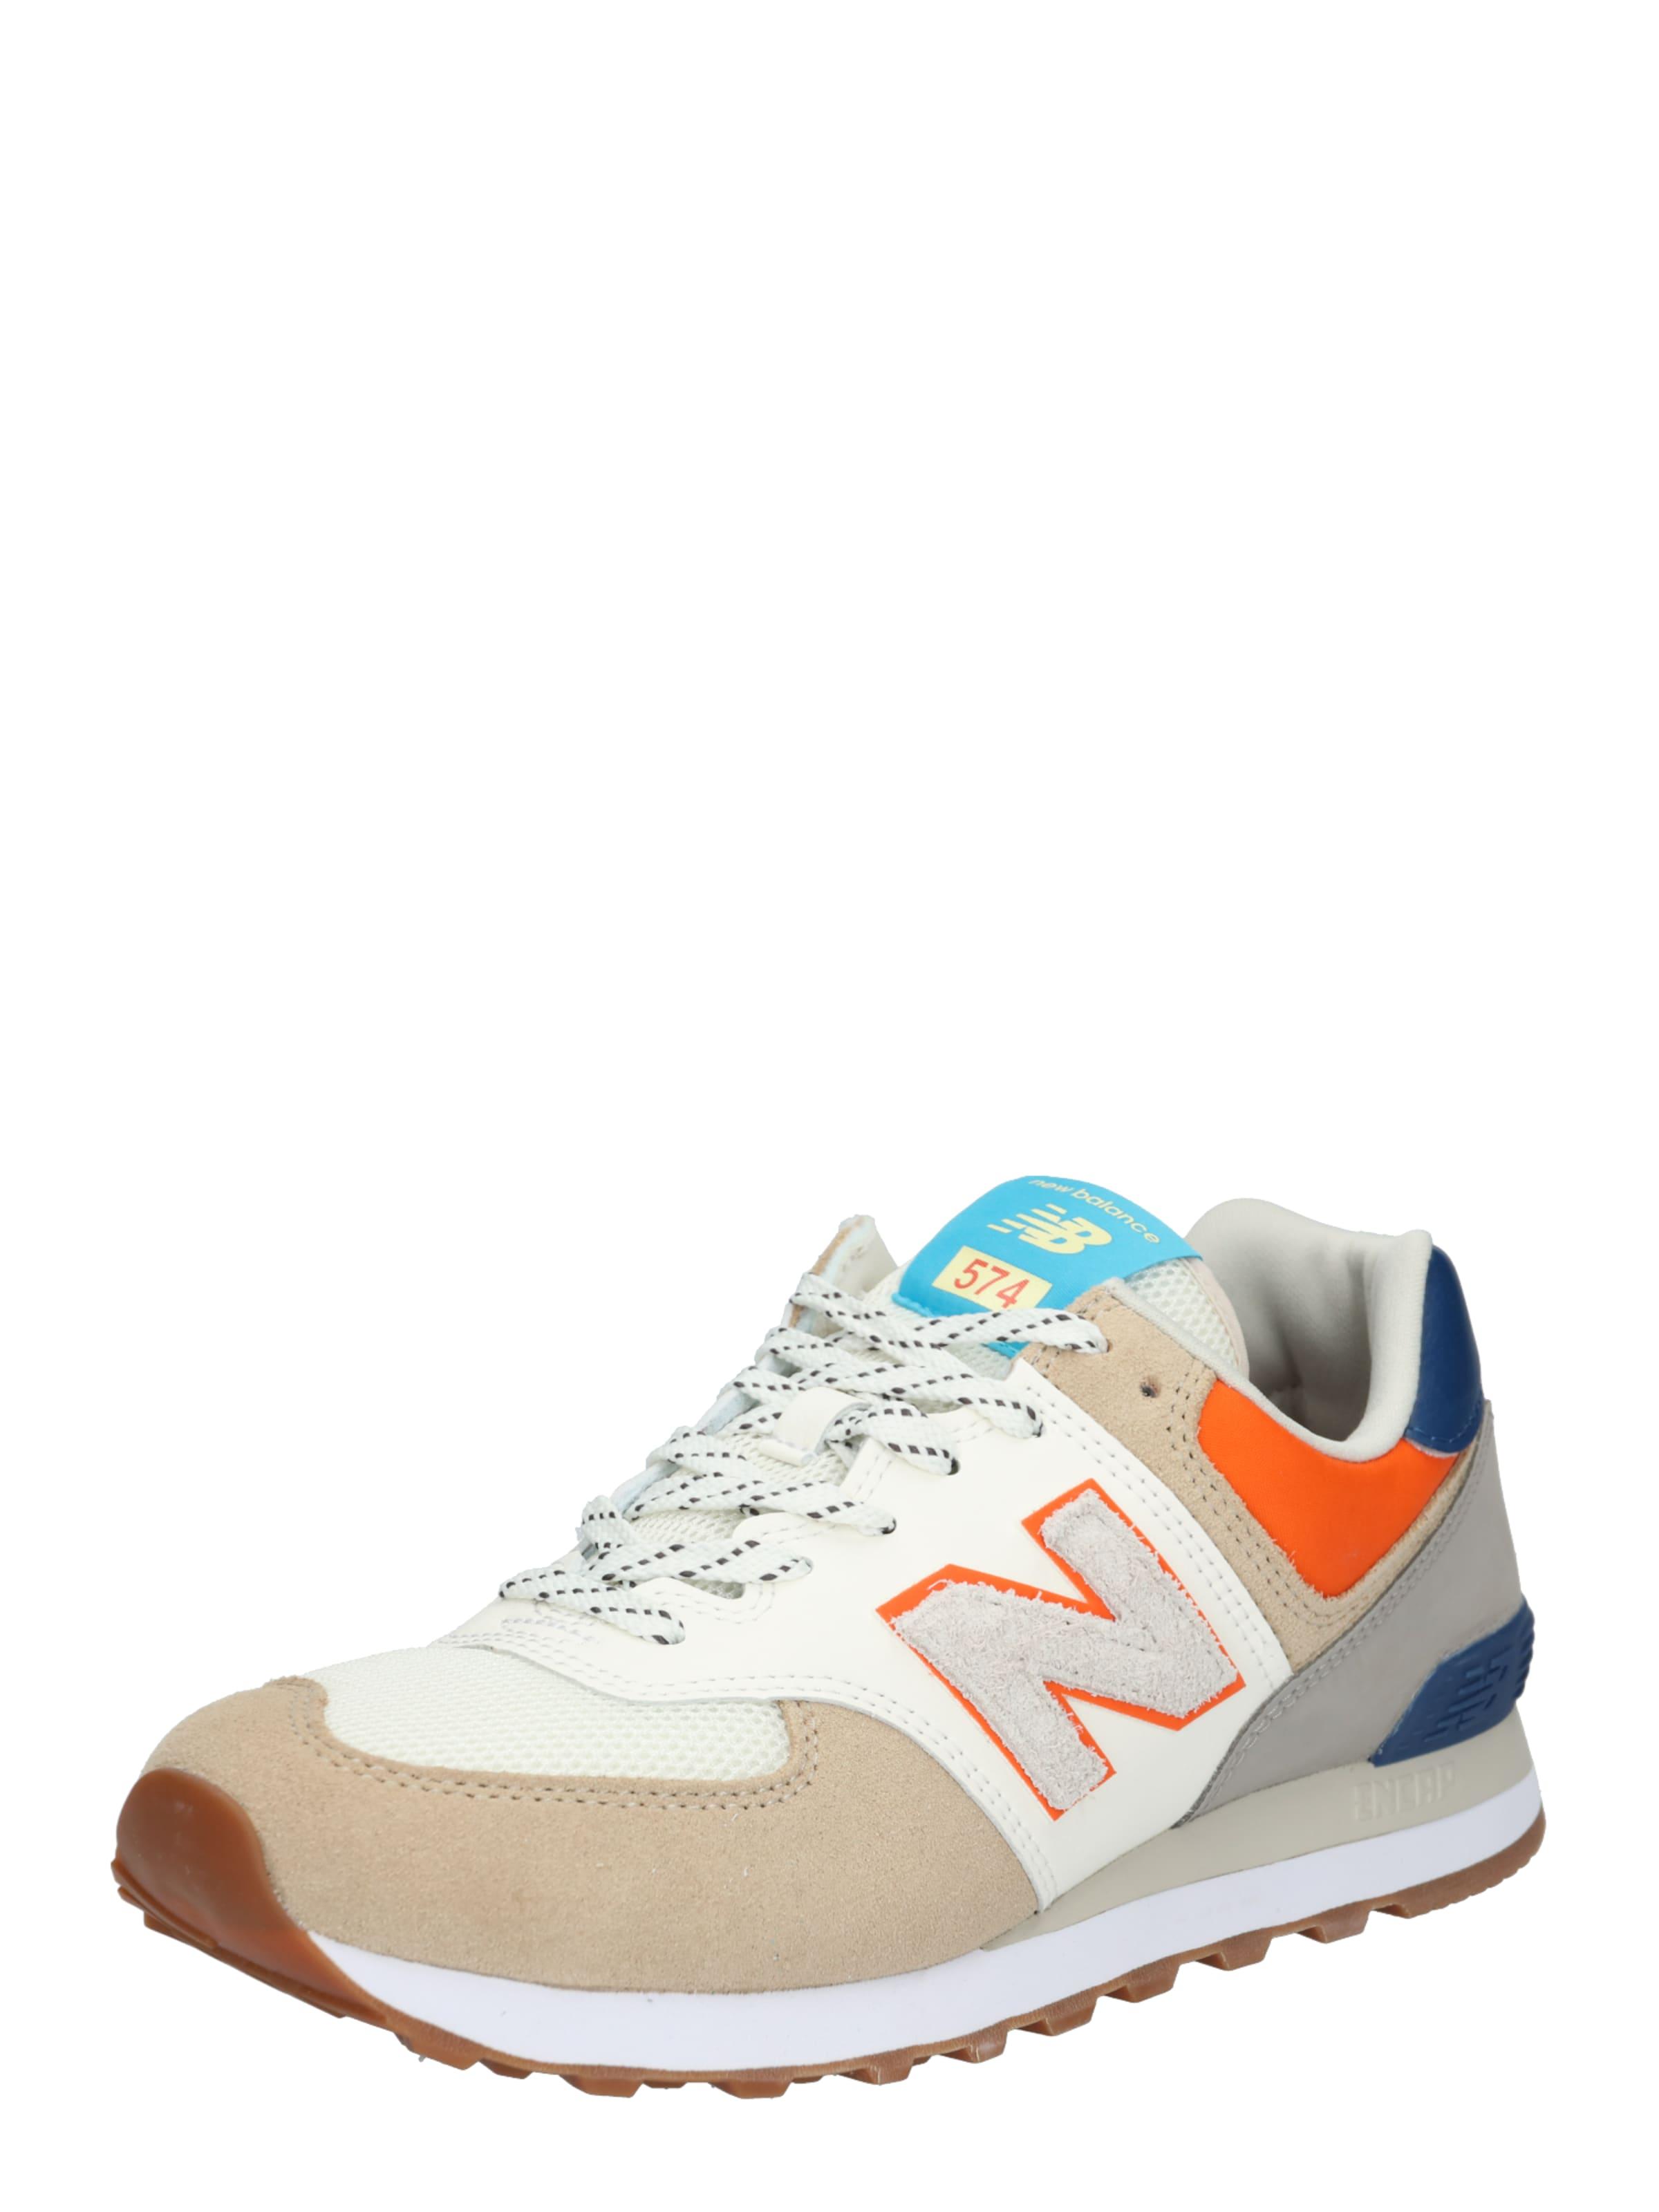 'ml574' In Balance Sneaker New Weiß BeigeBlau 8mnwvN0